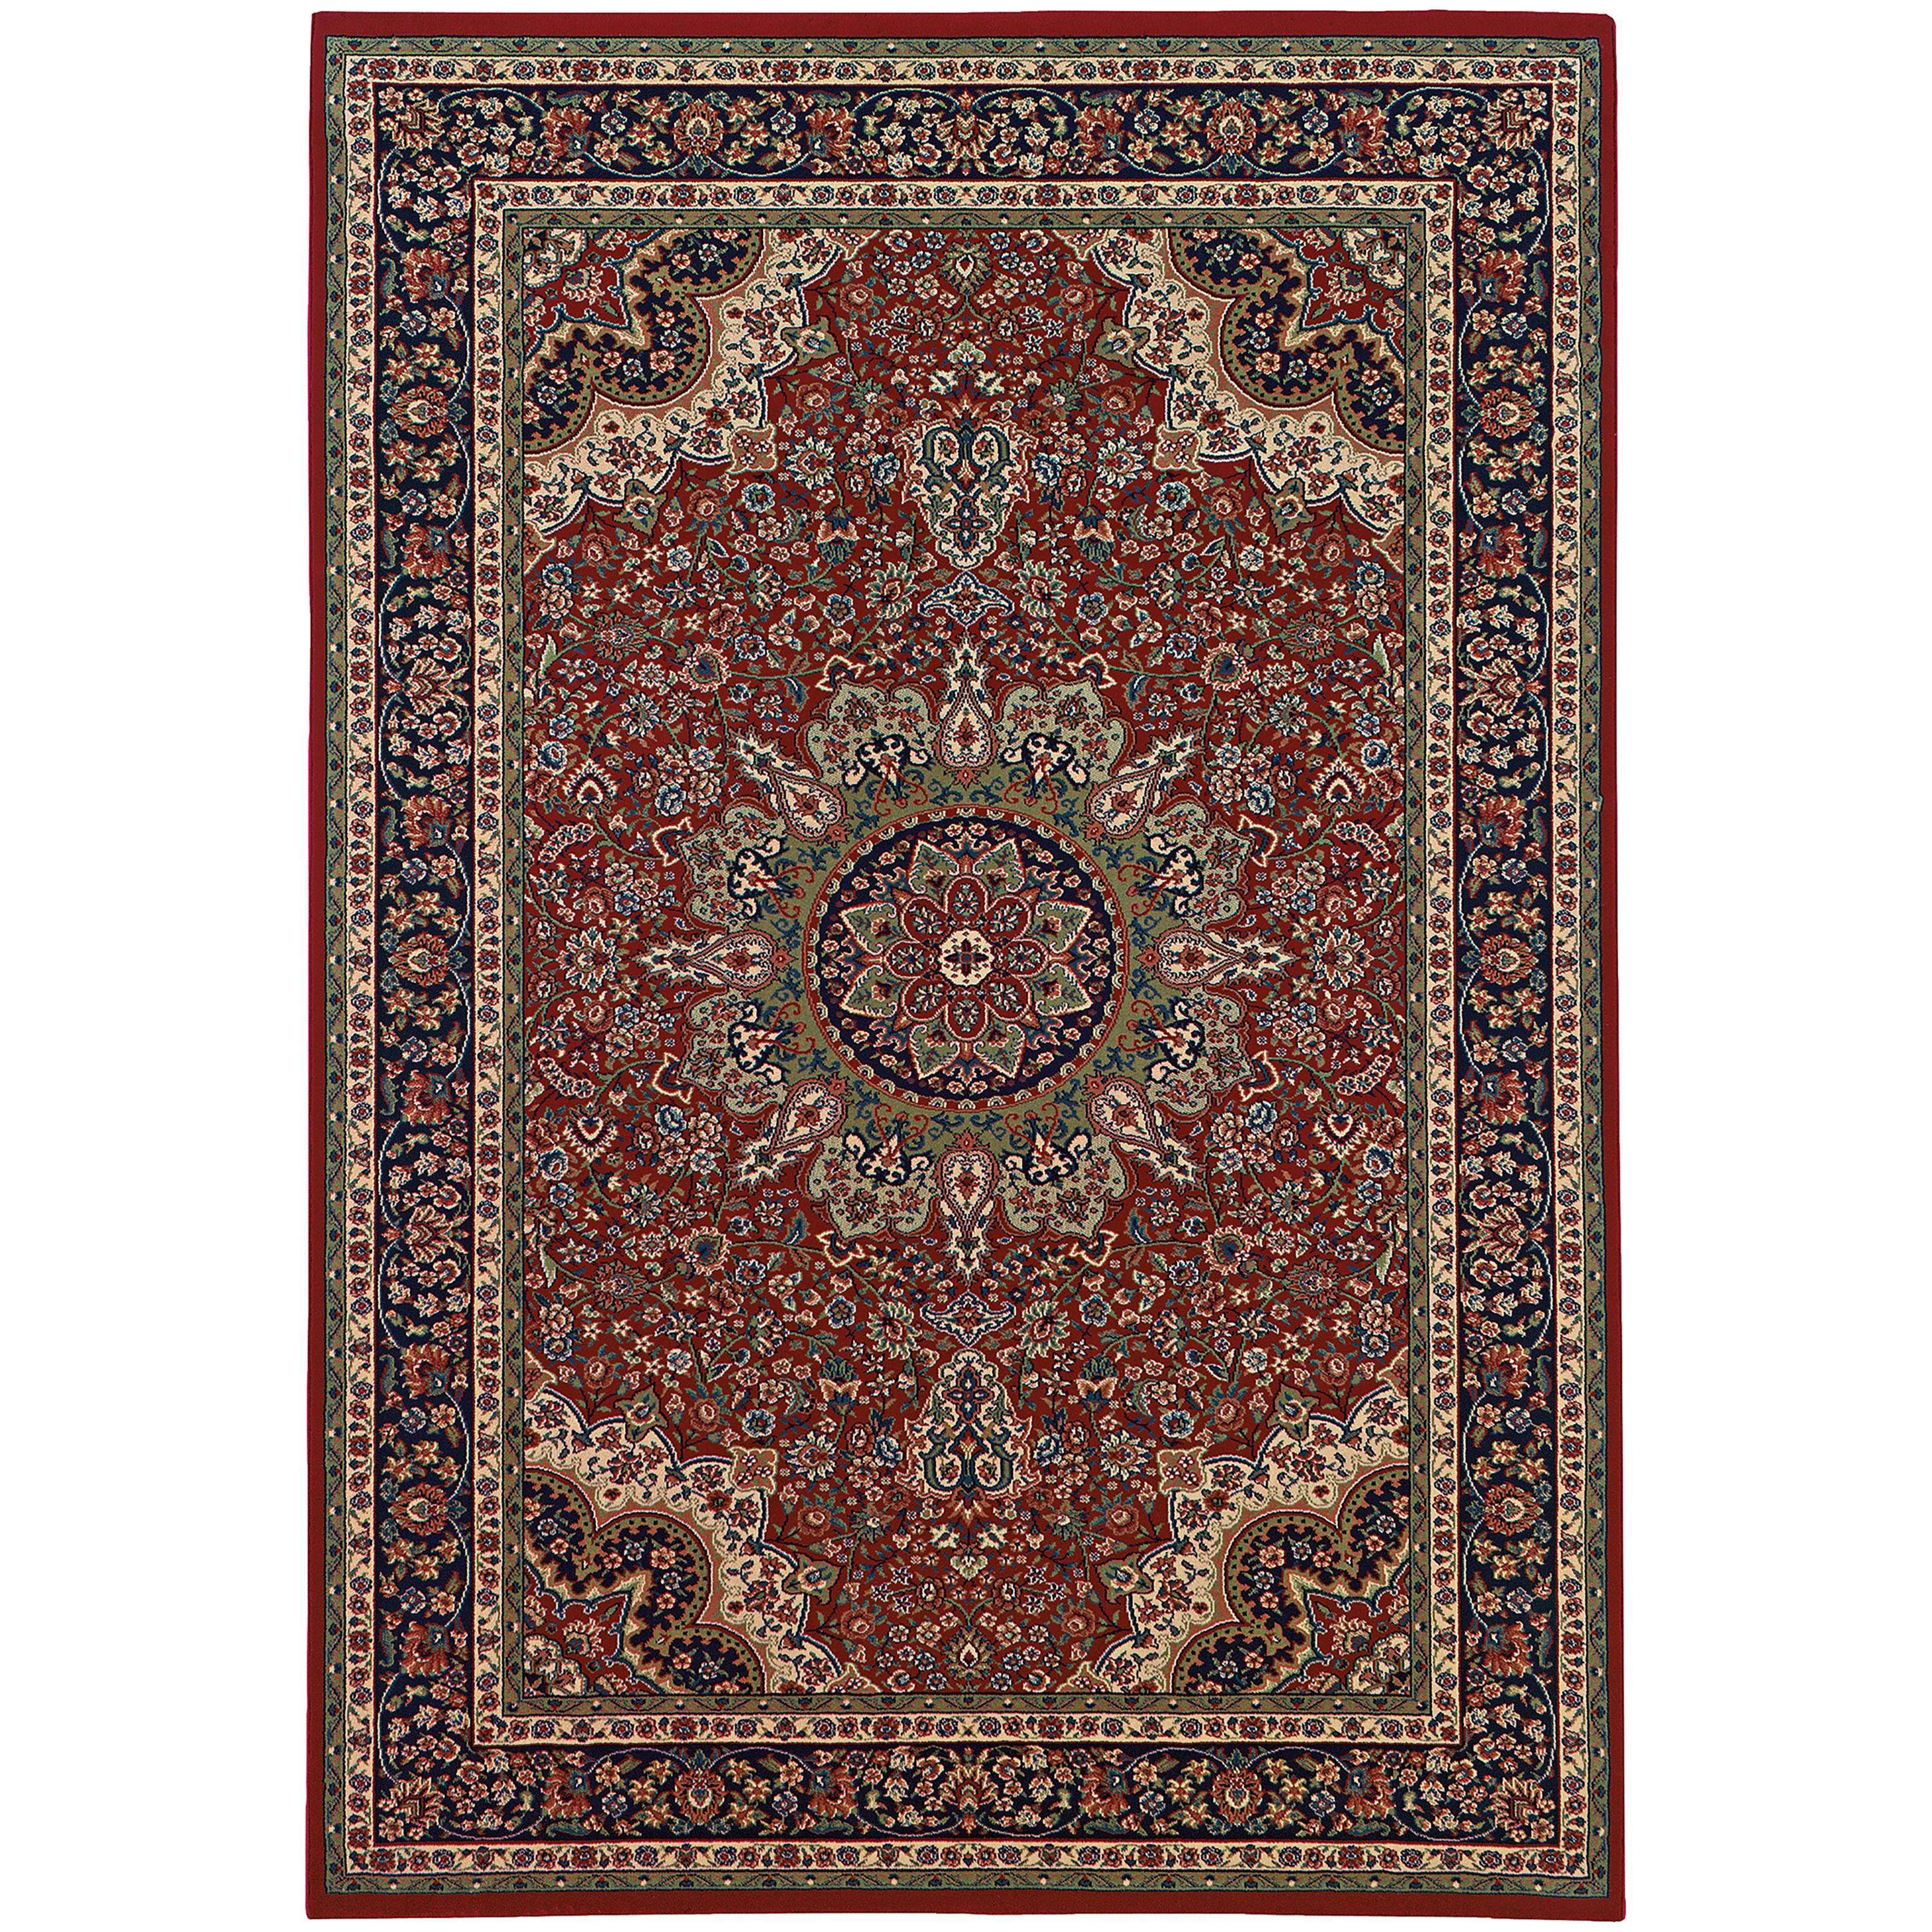 Oriental Weavers Ariana 12' X 15' Rug - Item Number: A116R3360450ST